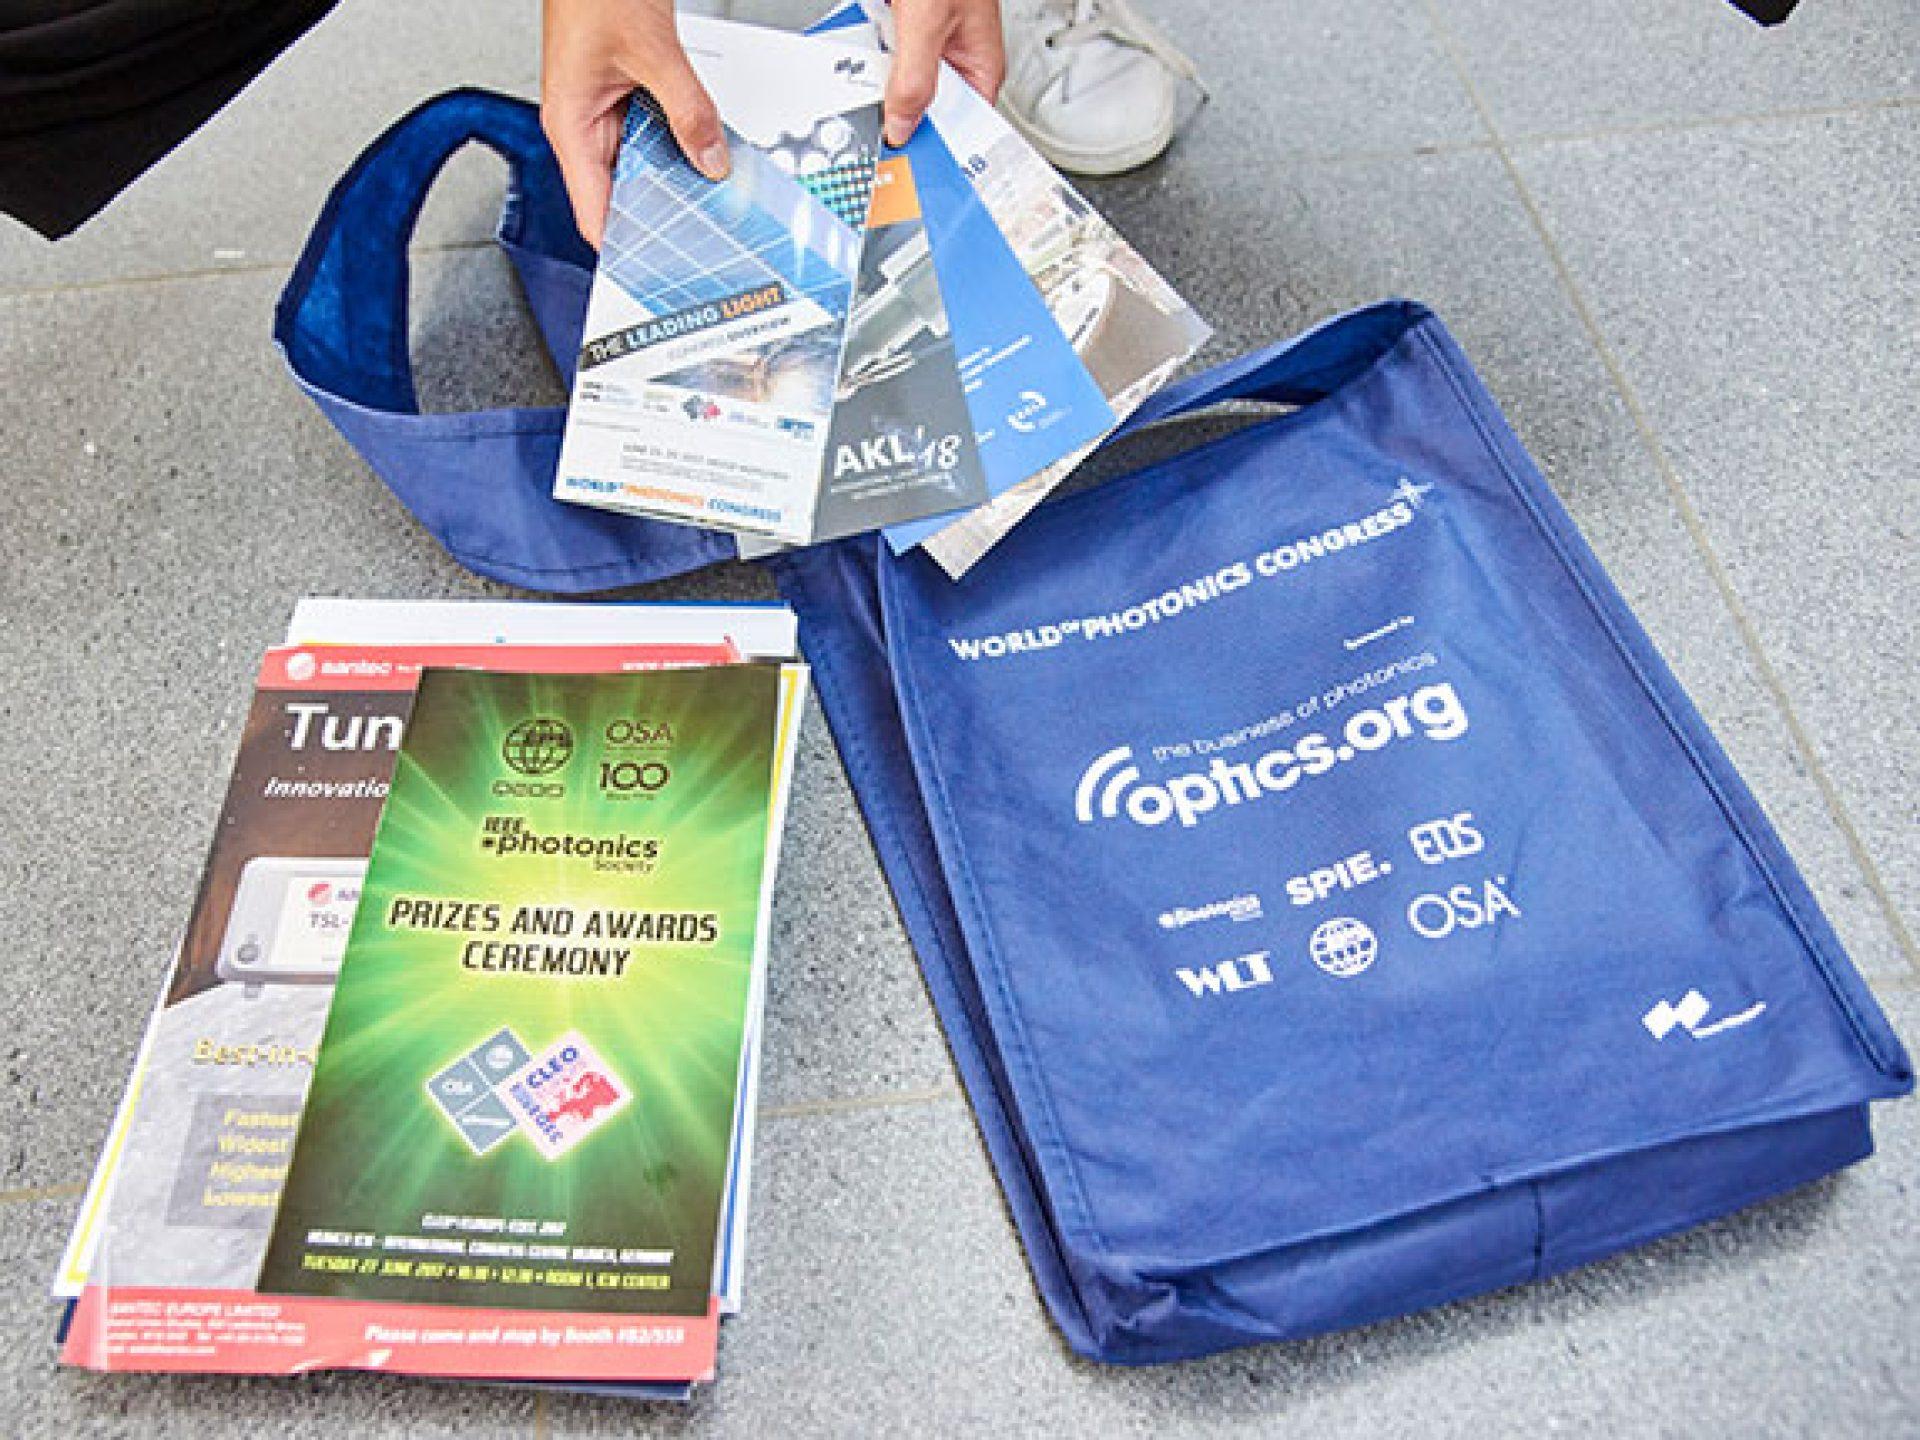 Informationsmaterial in der Konferenztasche